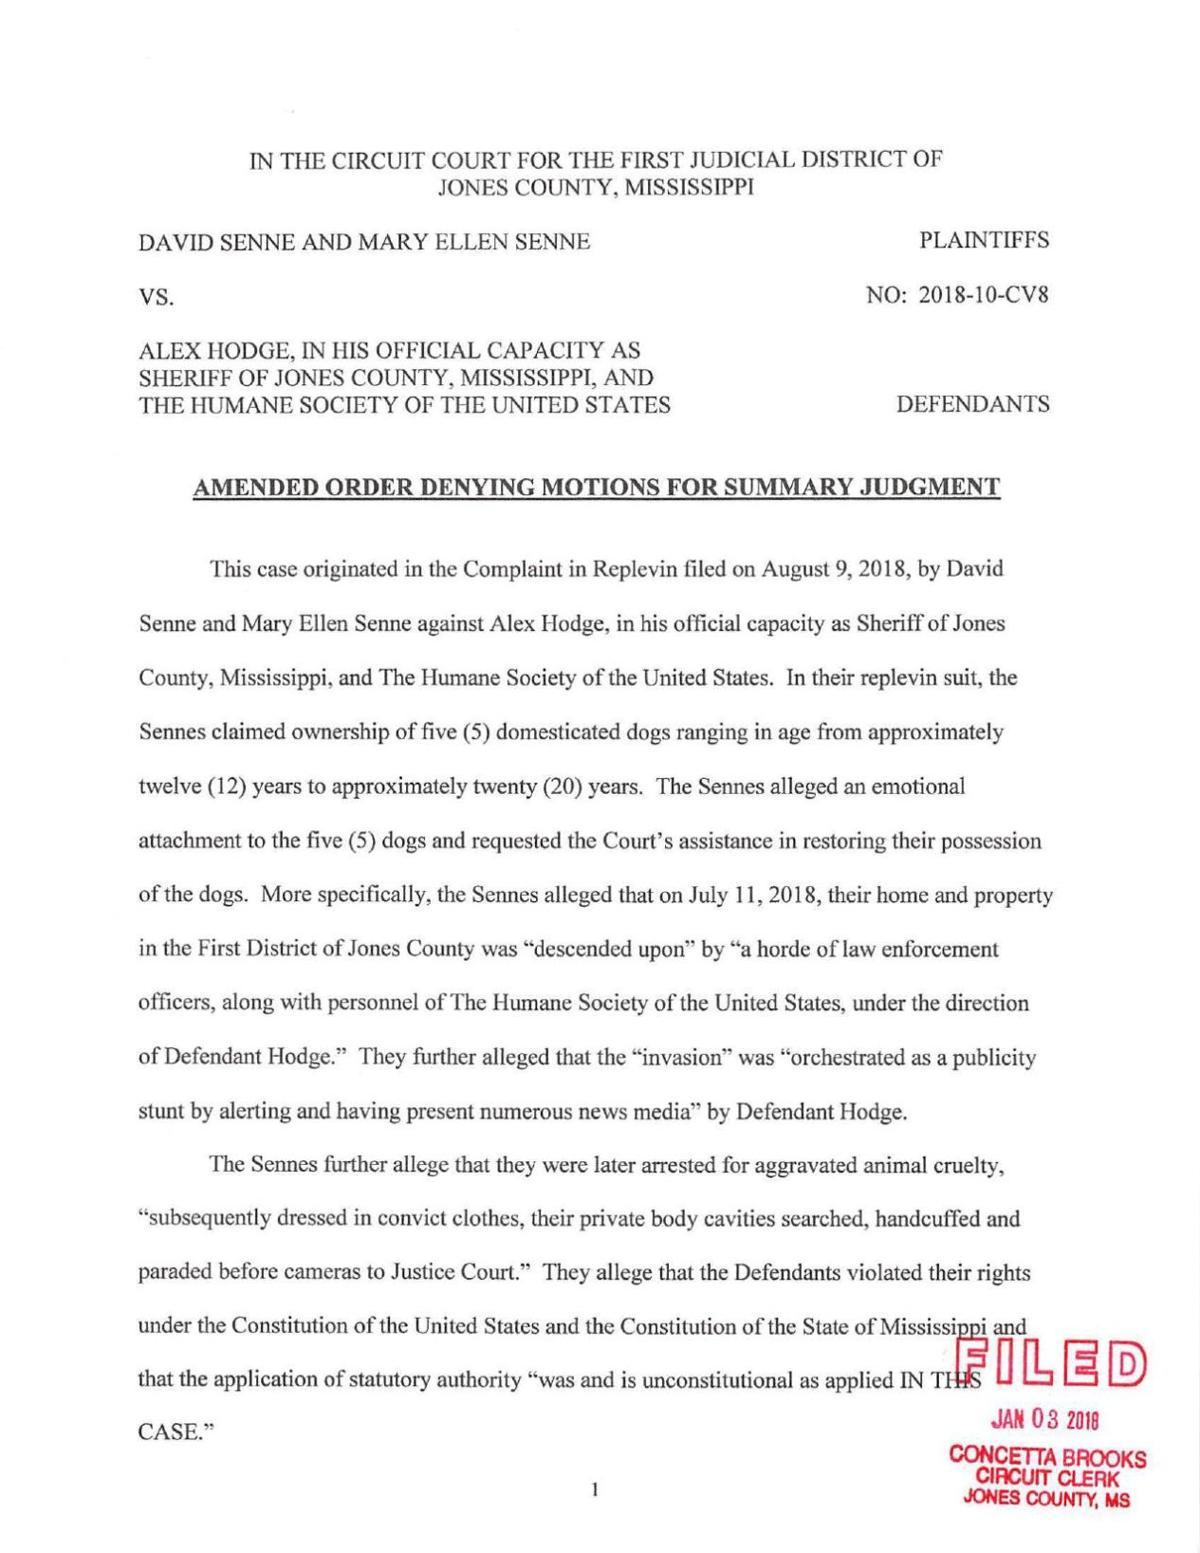 Williamson ruling on Lyon Ranch